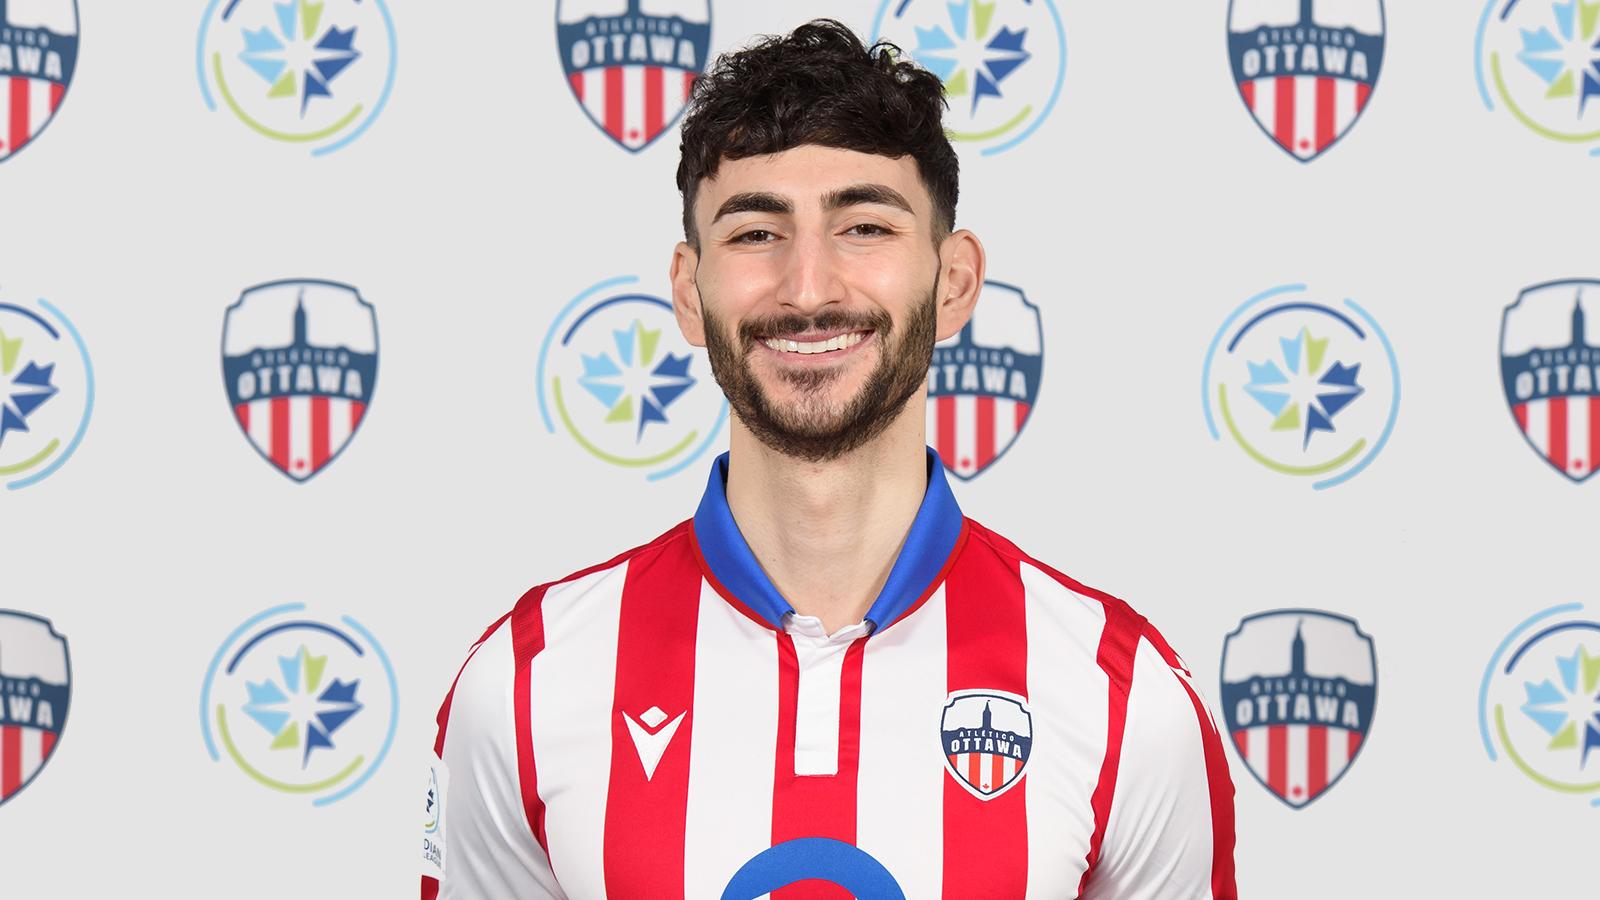 Chris Mannella of Atlético Ottawa. (Atlético Ottawa)